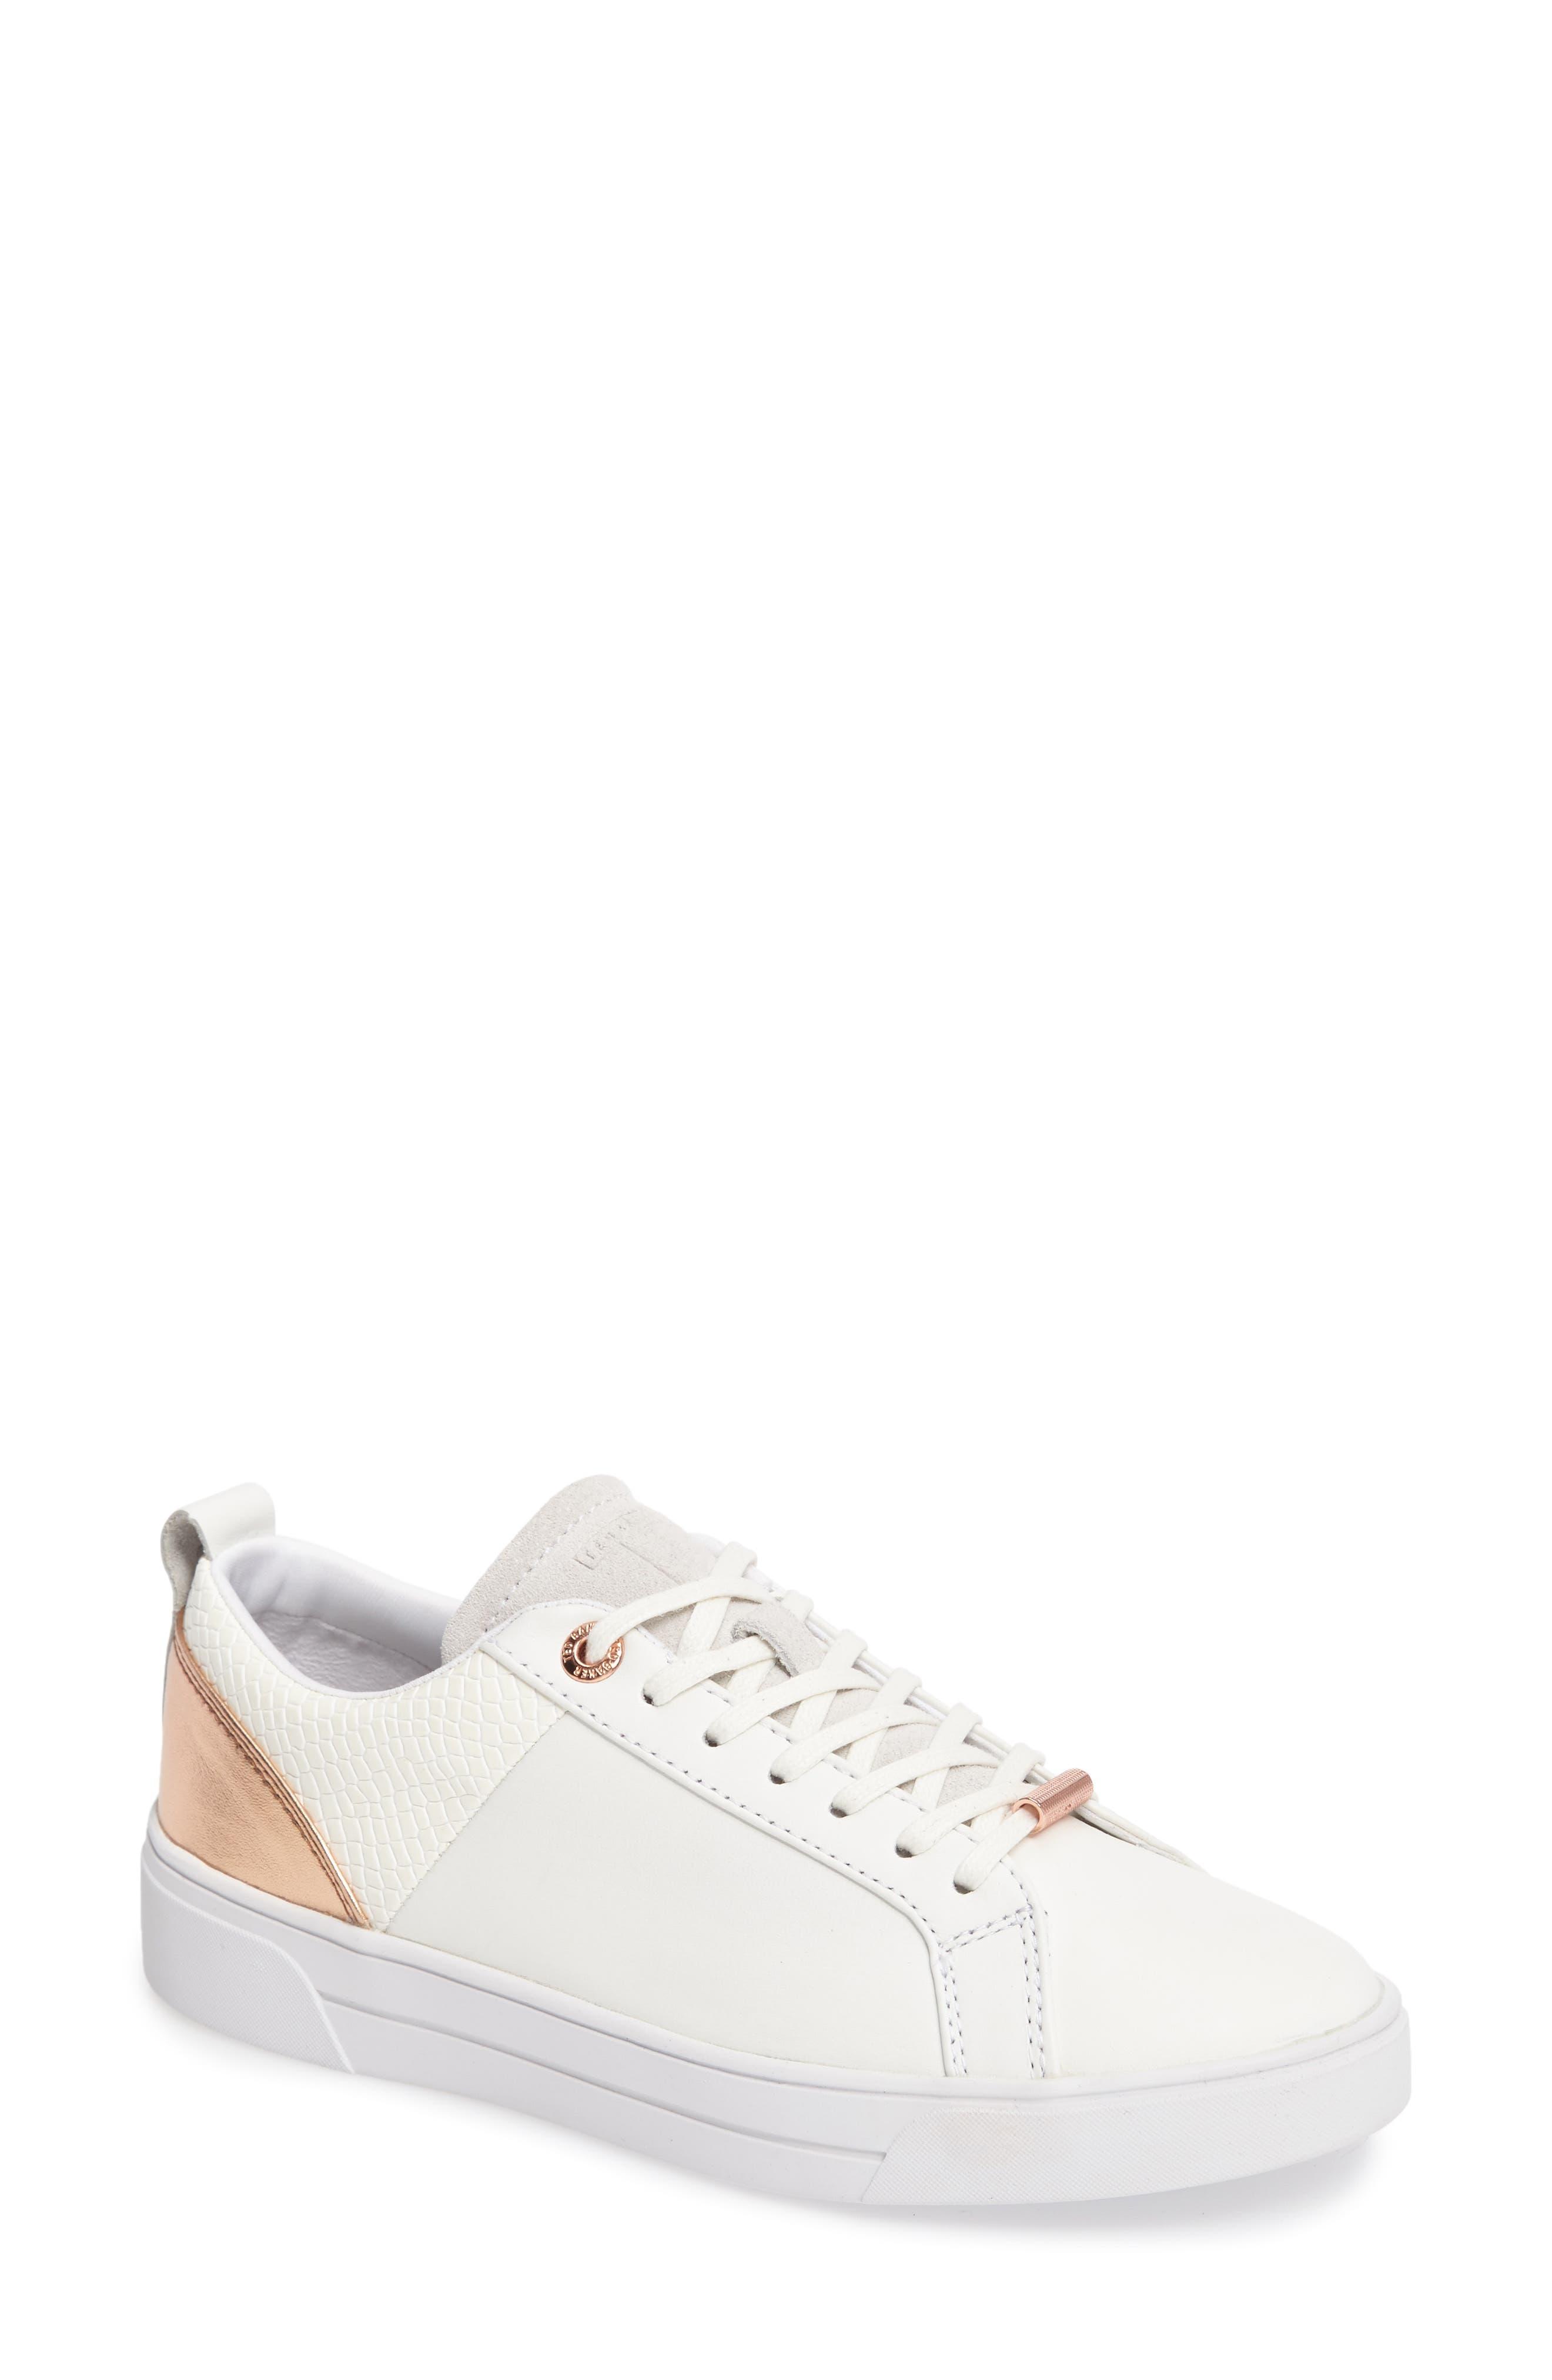 Kulei Lace-Up Sneaker,                             Main thumbnail 1, color,                             112